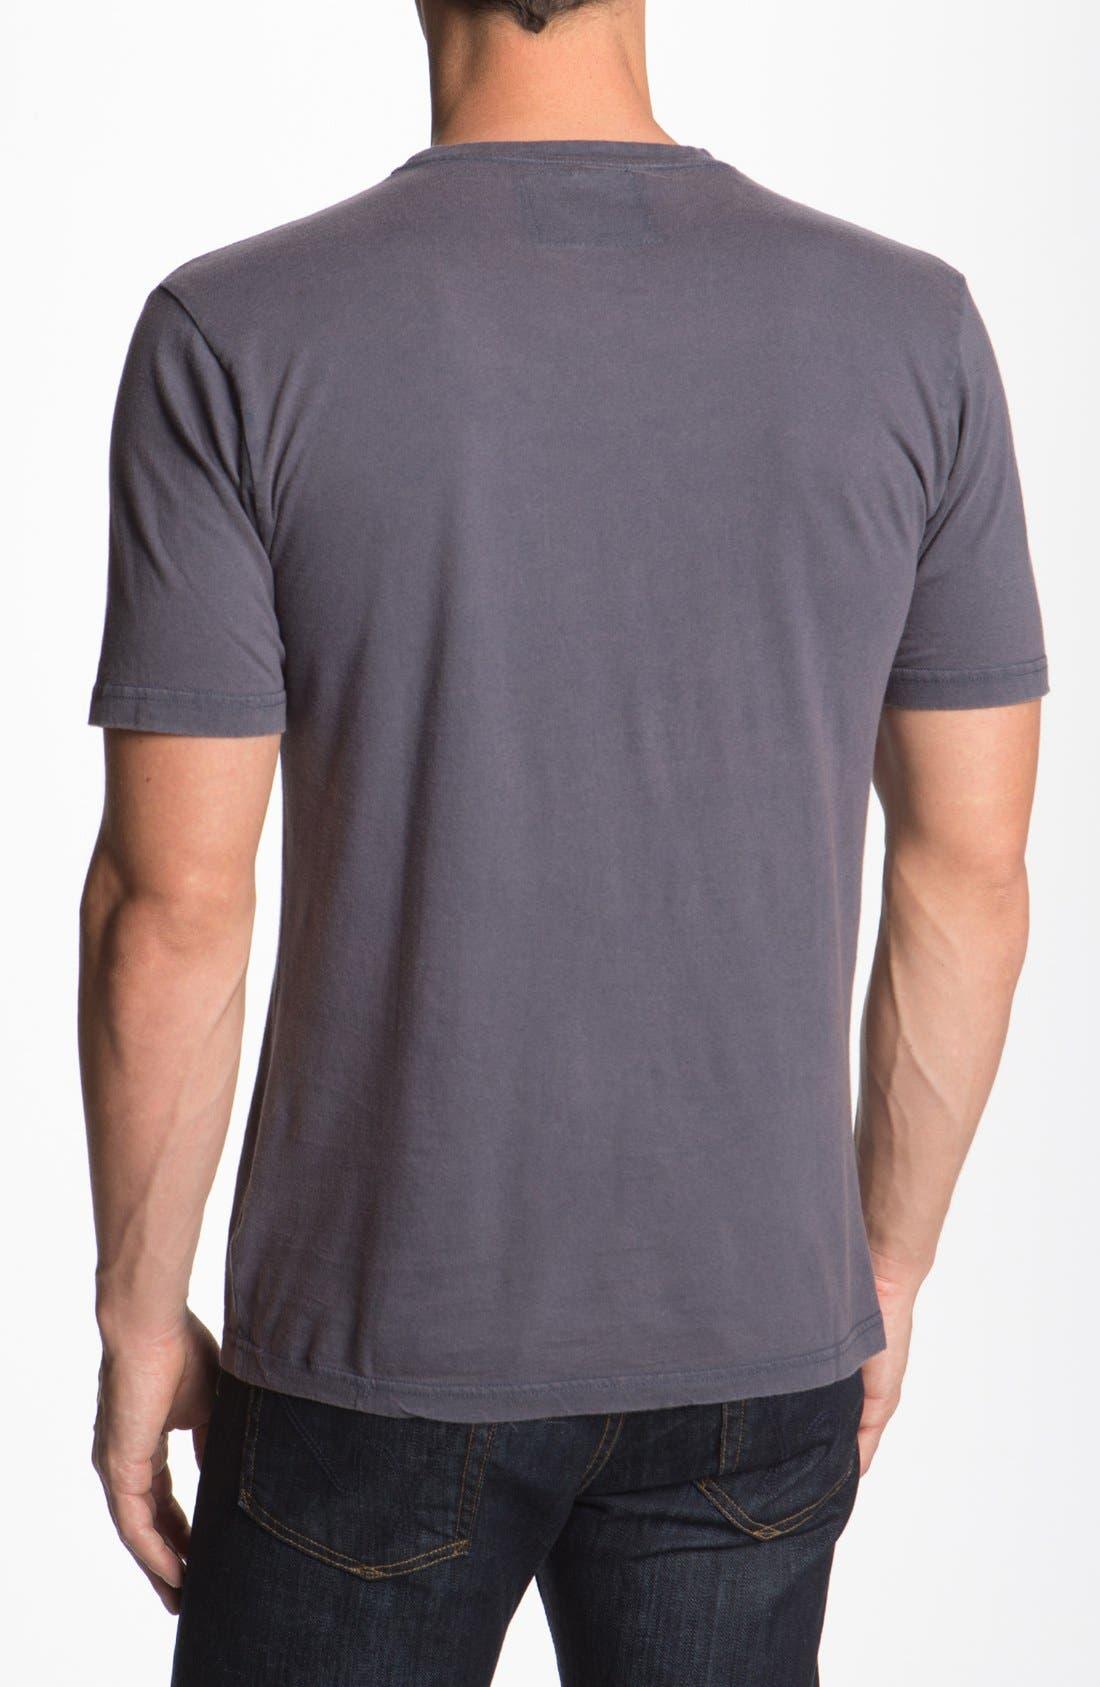 'Los Angeles Angels' Trim Fit T-Shirt,                             Alternate thumbnail 2, color,                             Navy - Angels